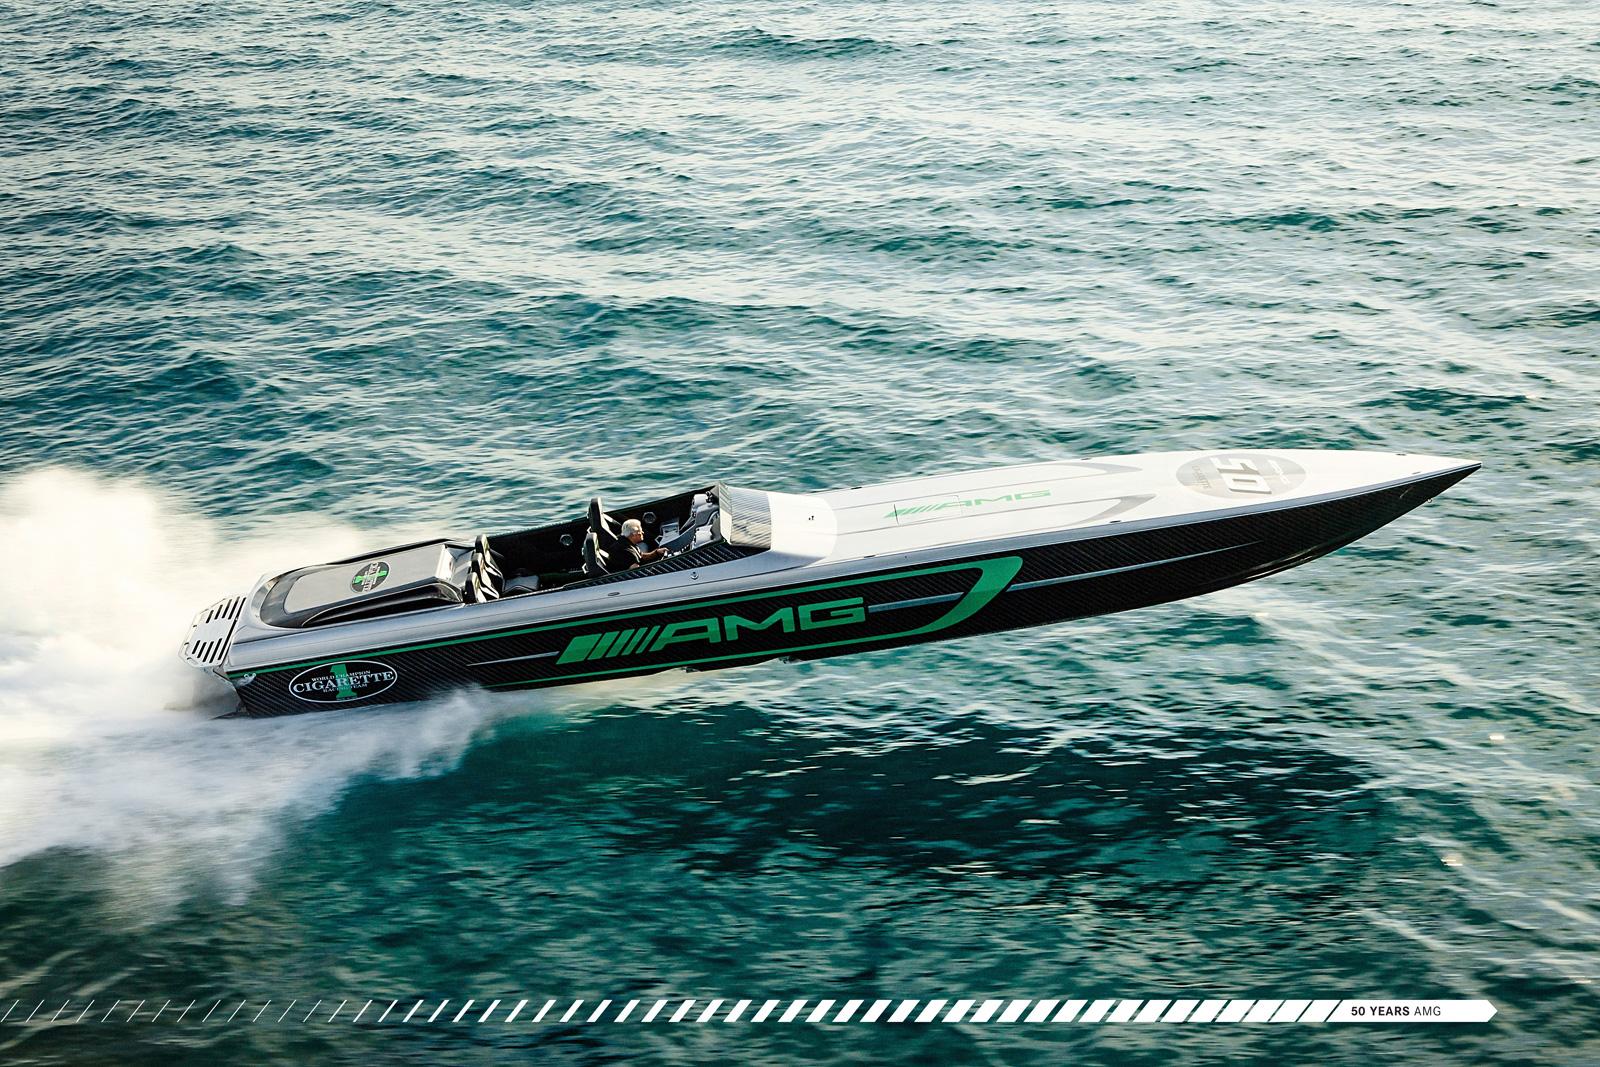 cigarette-racing-team-50-marauder-amg-boat-08